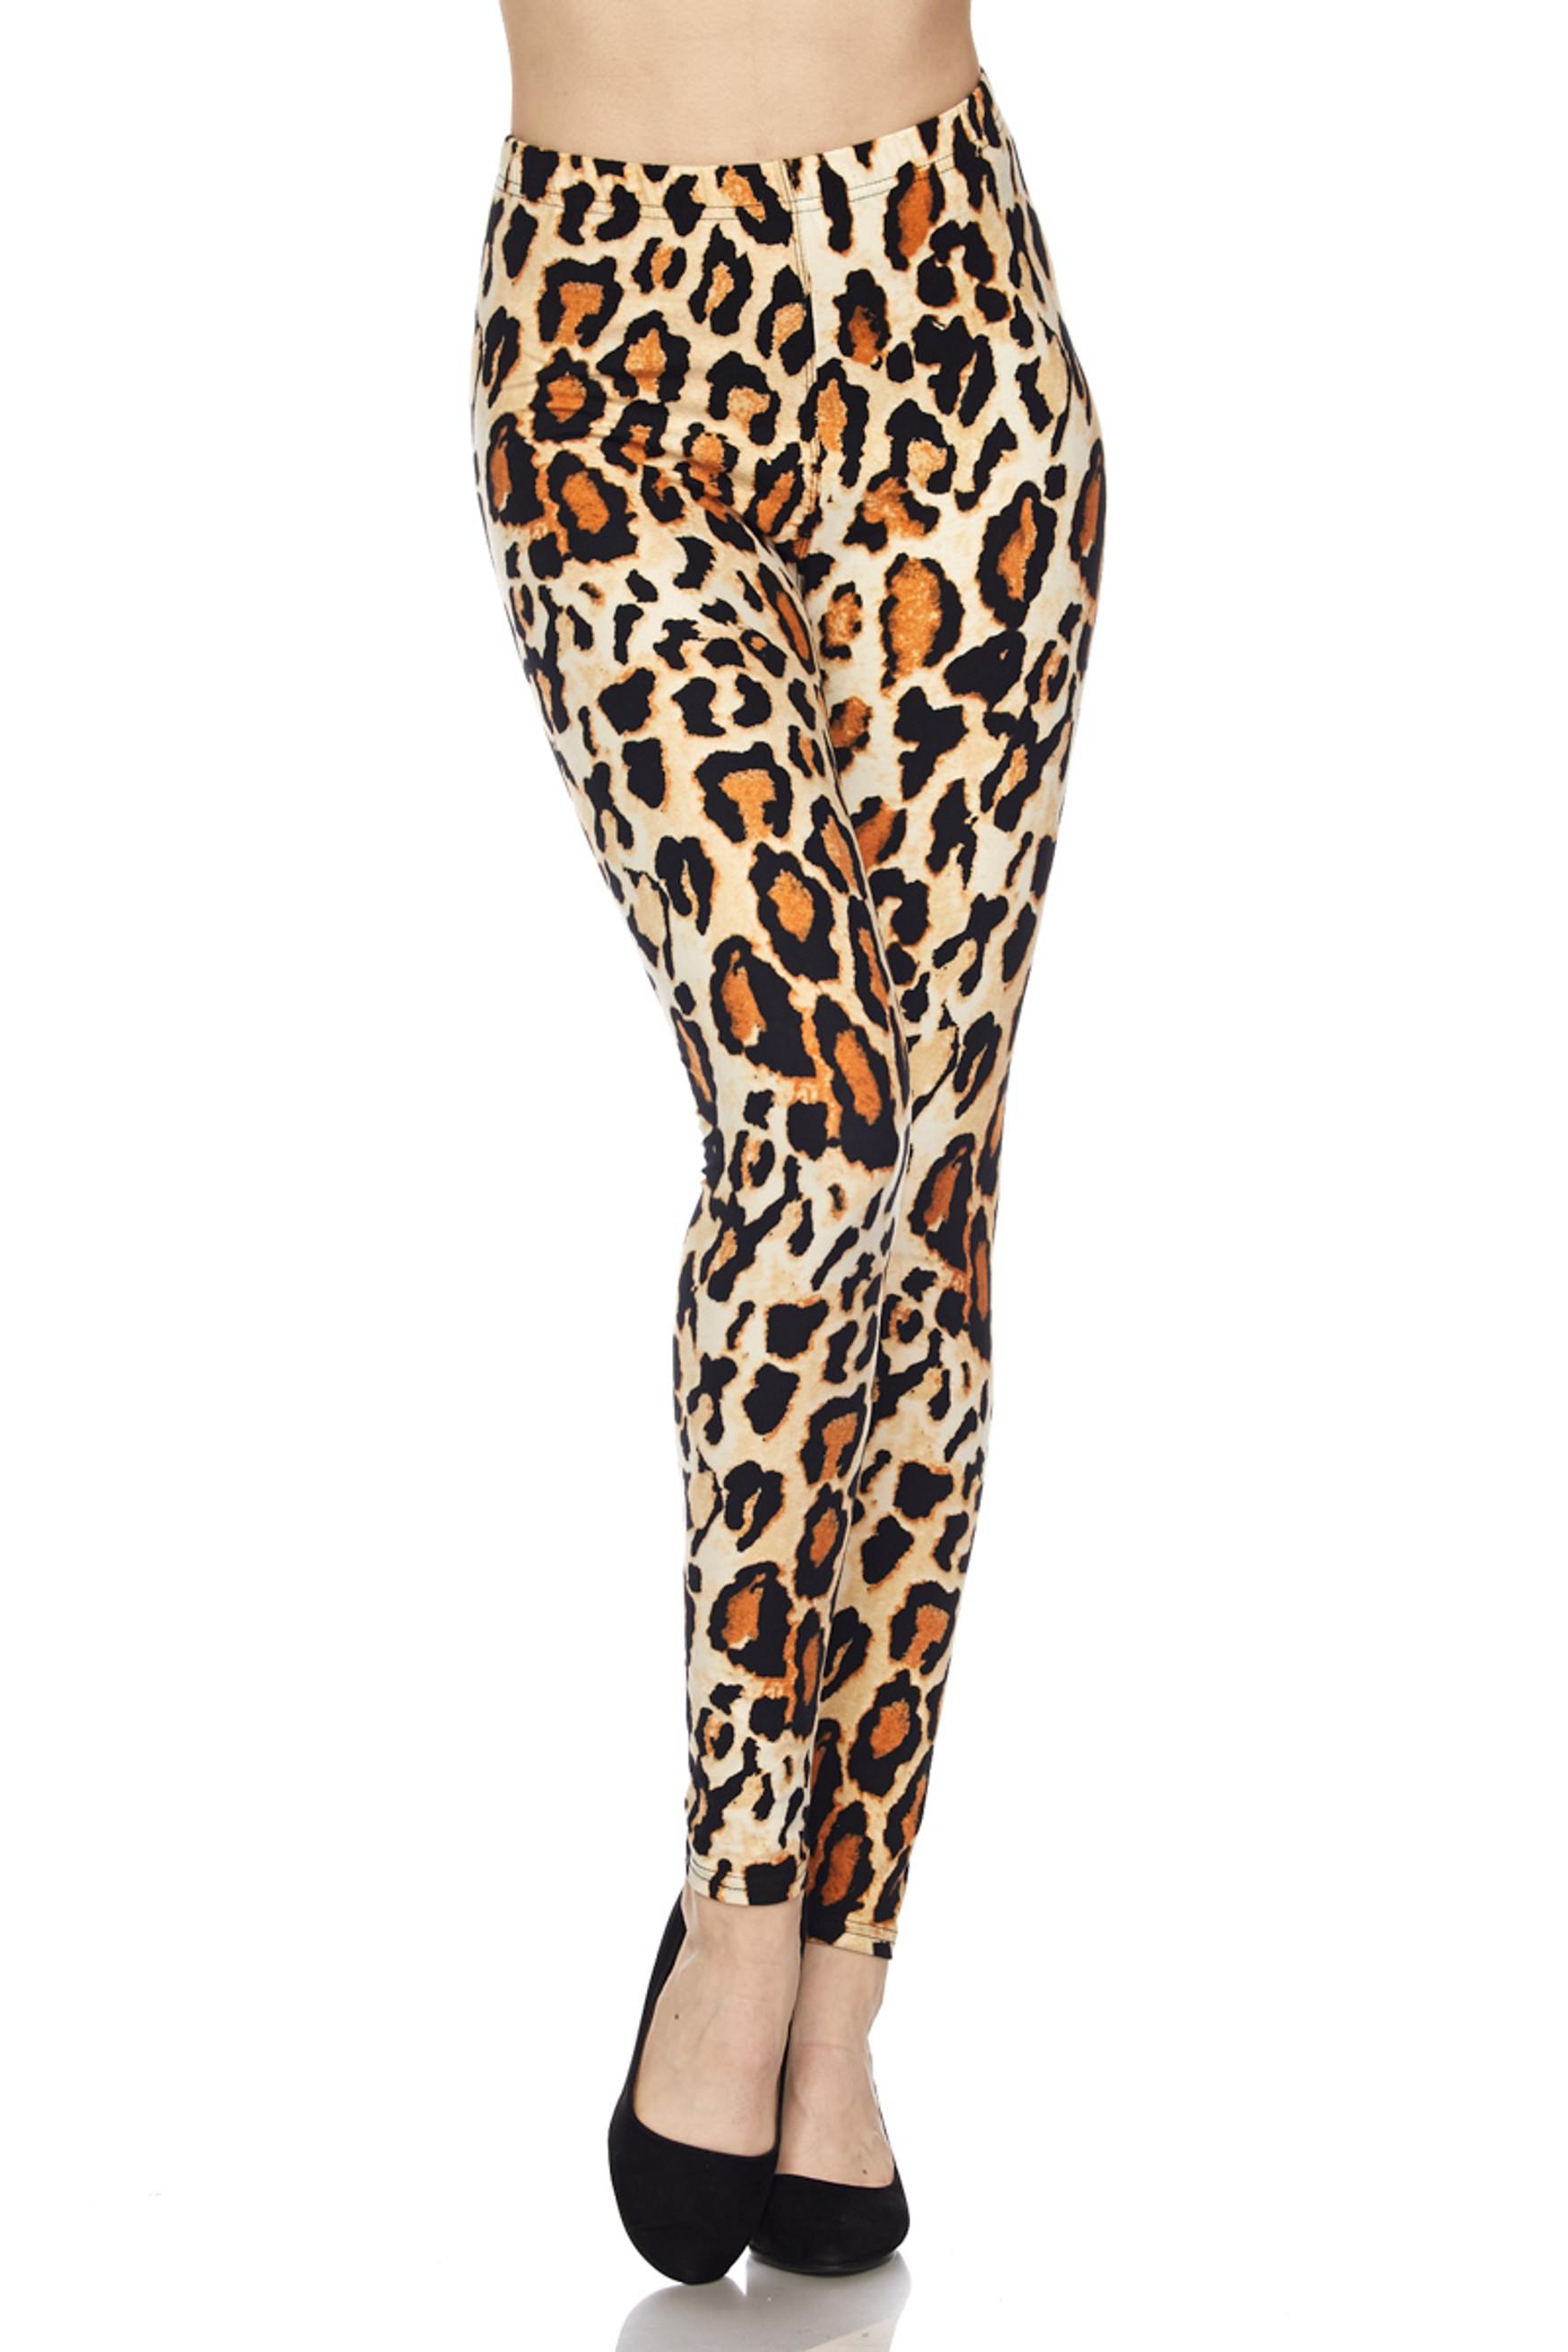 BrushedBrazilian Leopard Plus Size Leggings - 3X-5X